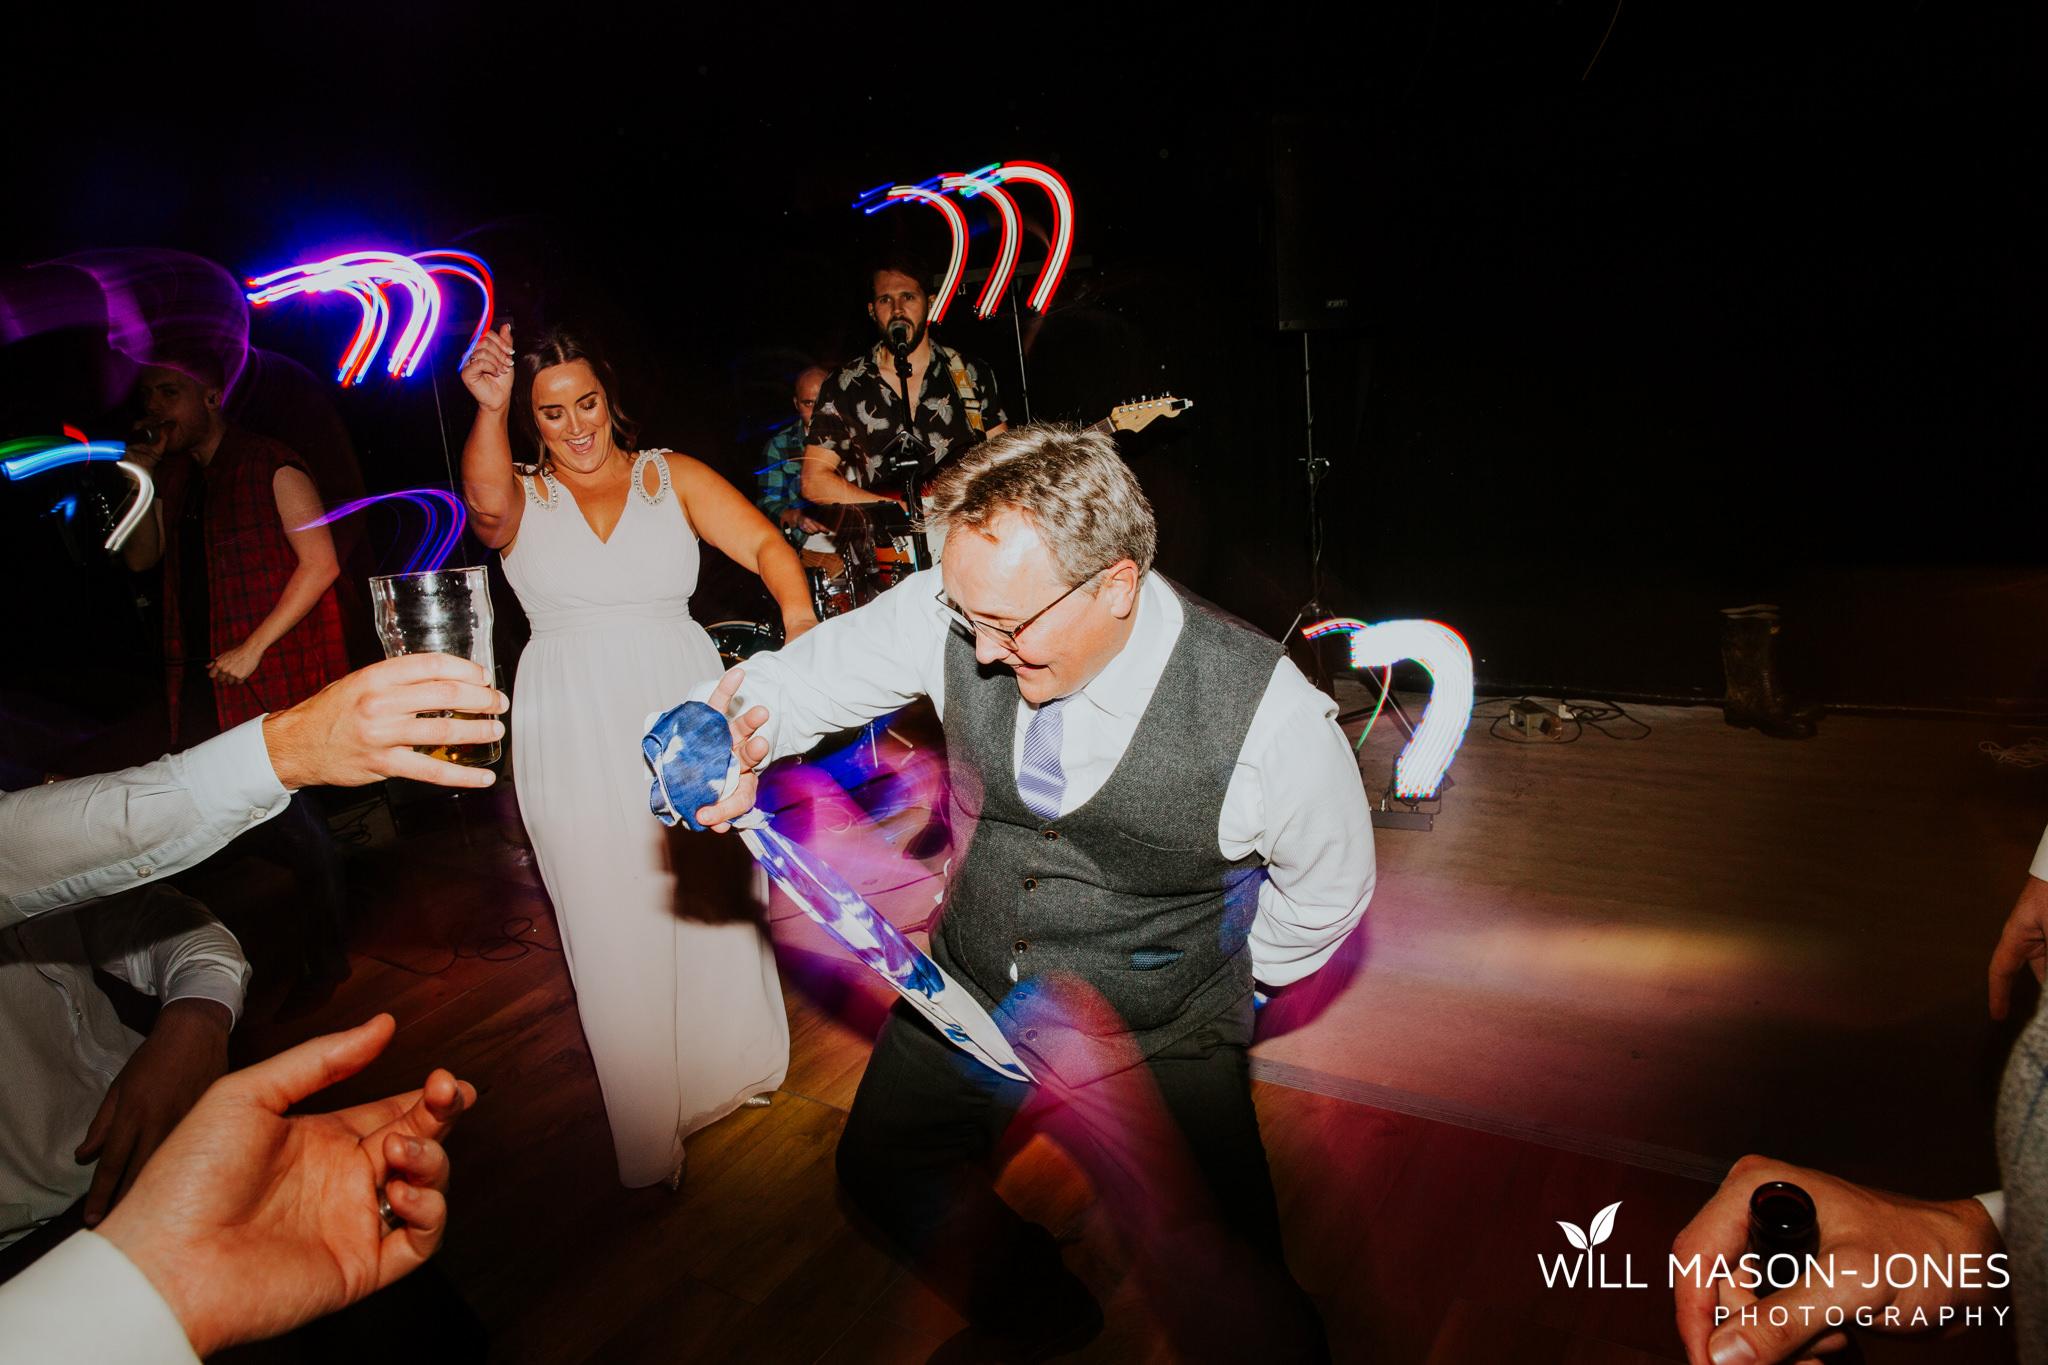 plas-glansevin-fun-evening-reception-dancefloor-photographer-swansea-9.jpg